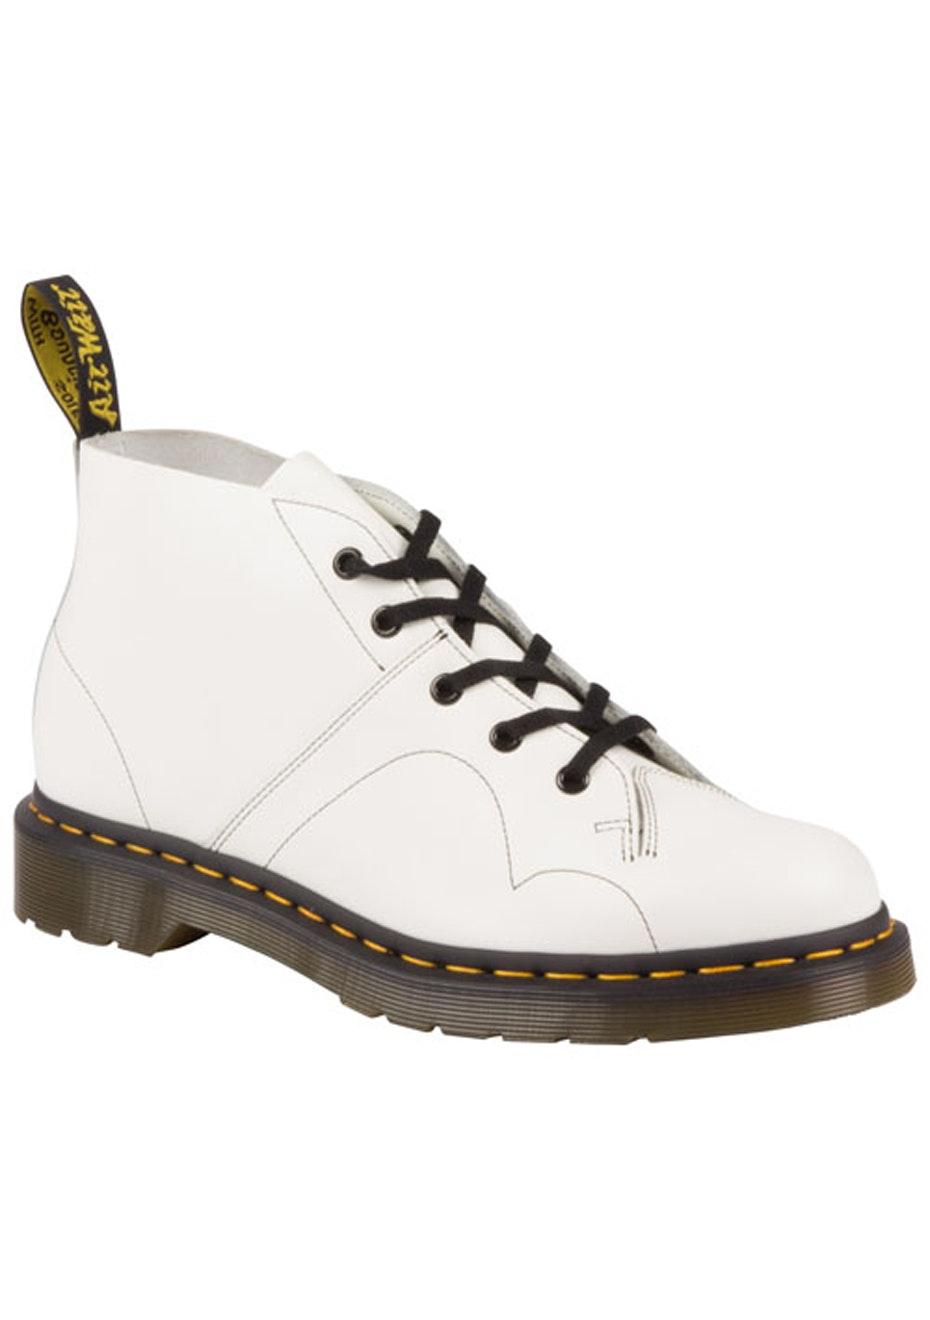 DR MARTENS - Church Monkey Boot - White